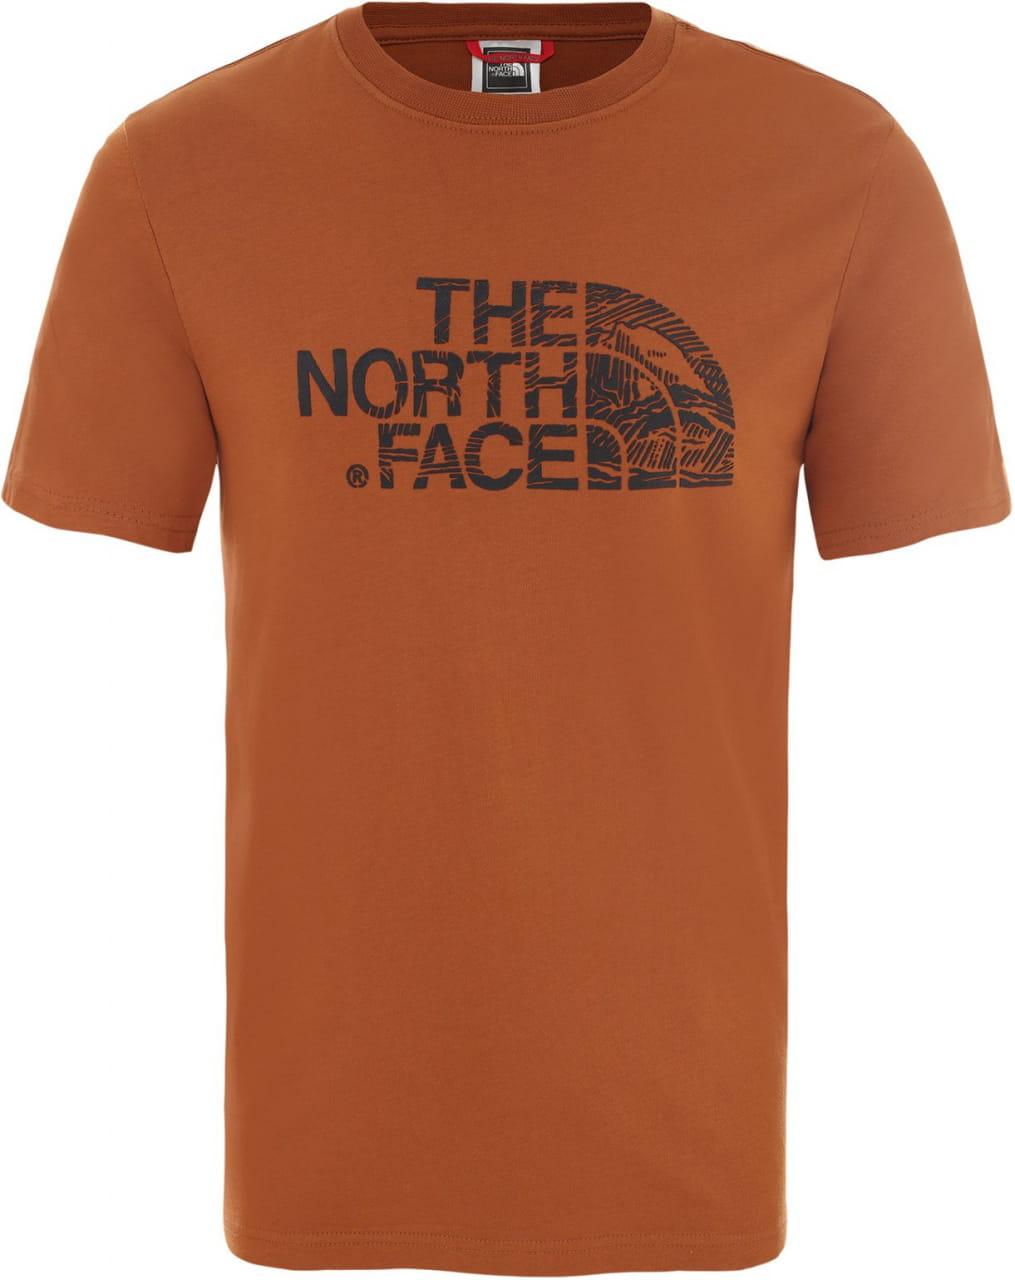 Pánské tričko The North Face Men's Woodcut Dome T-Shirt